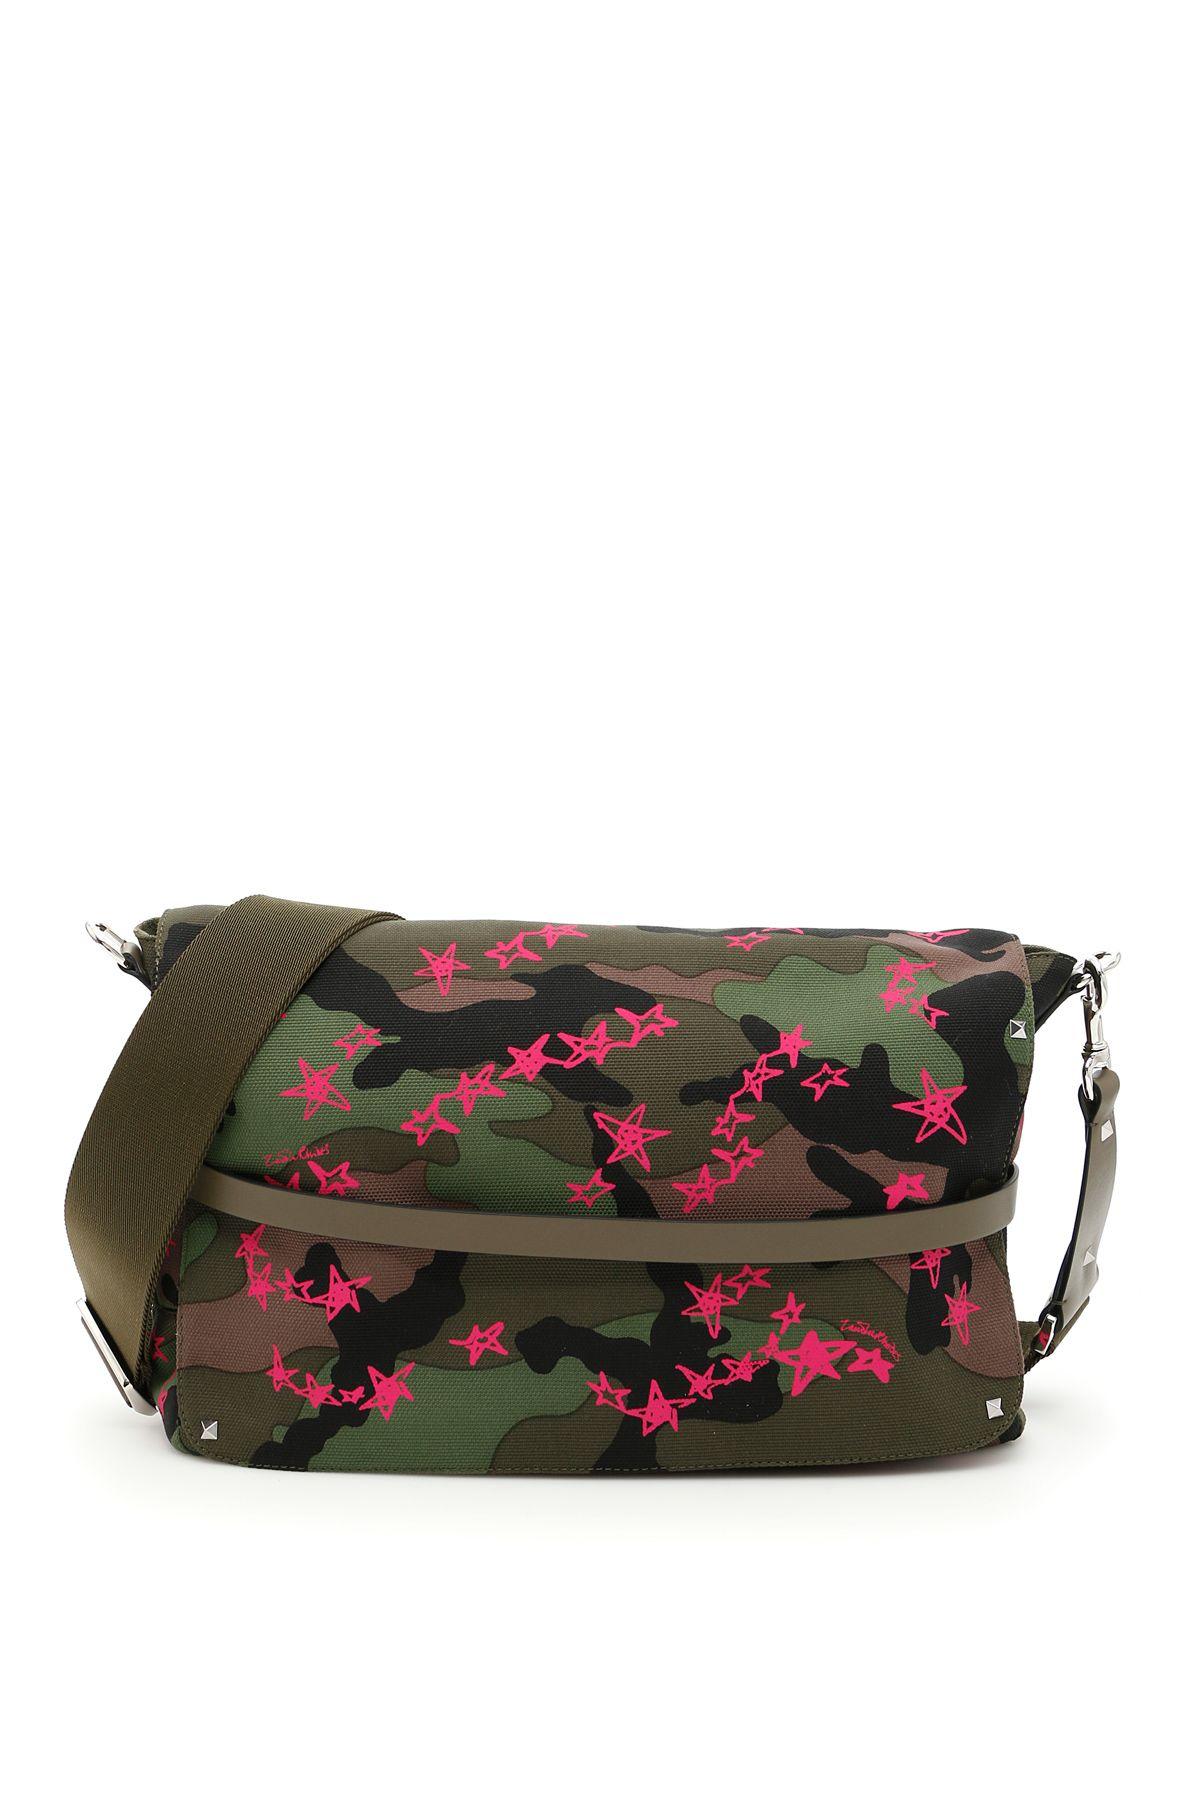 Valentino Shoulder Valentino Camouflage Canvas Messenger Bag